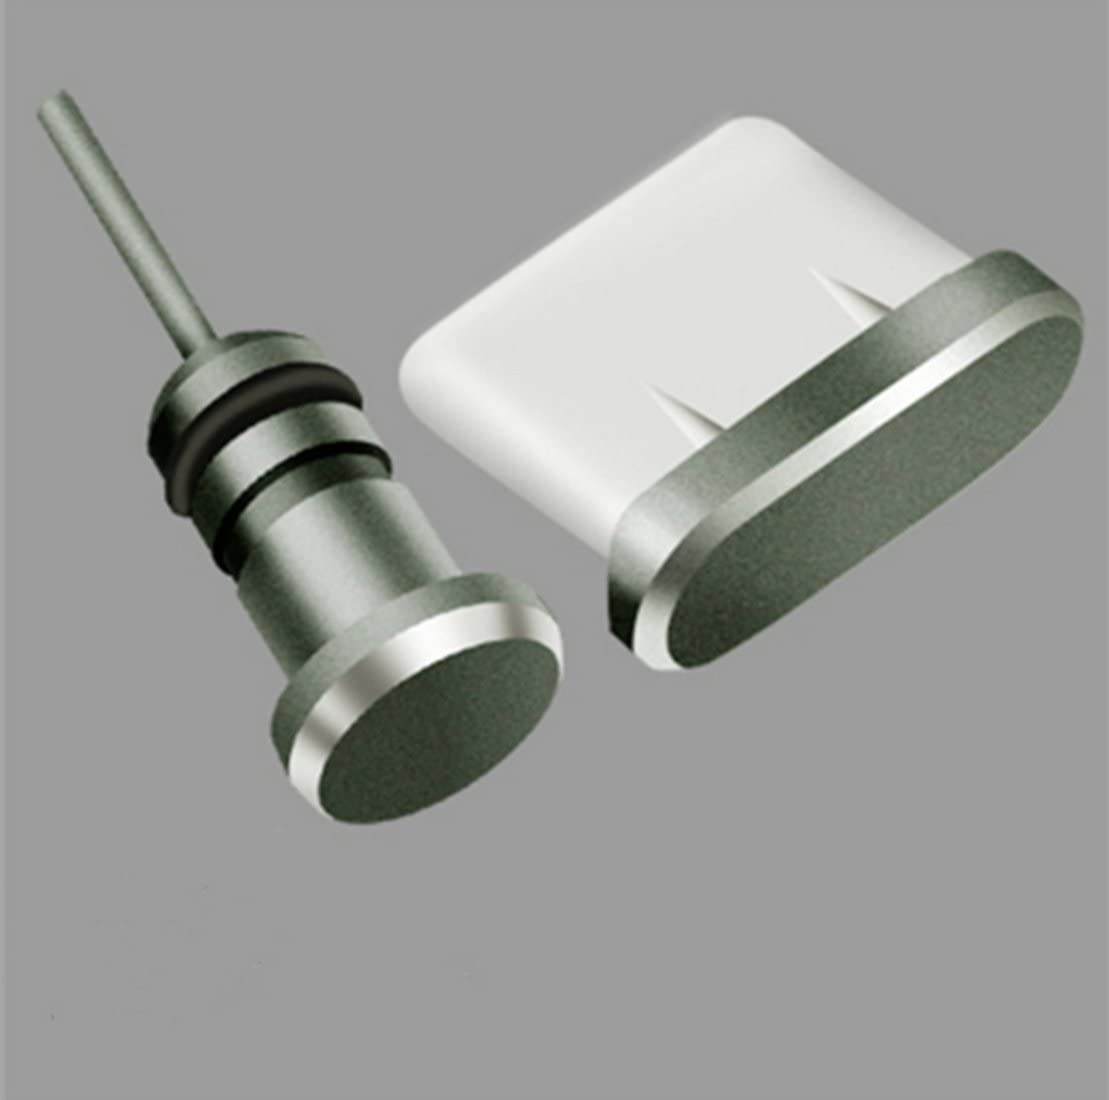 HOMEYU Sale Premium New Free Shipping Aluminum Anti-Dust Plug C and USB Head Type